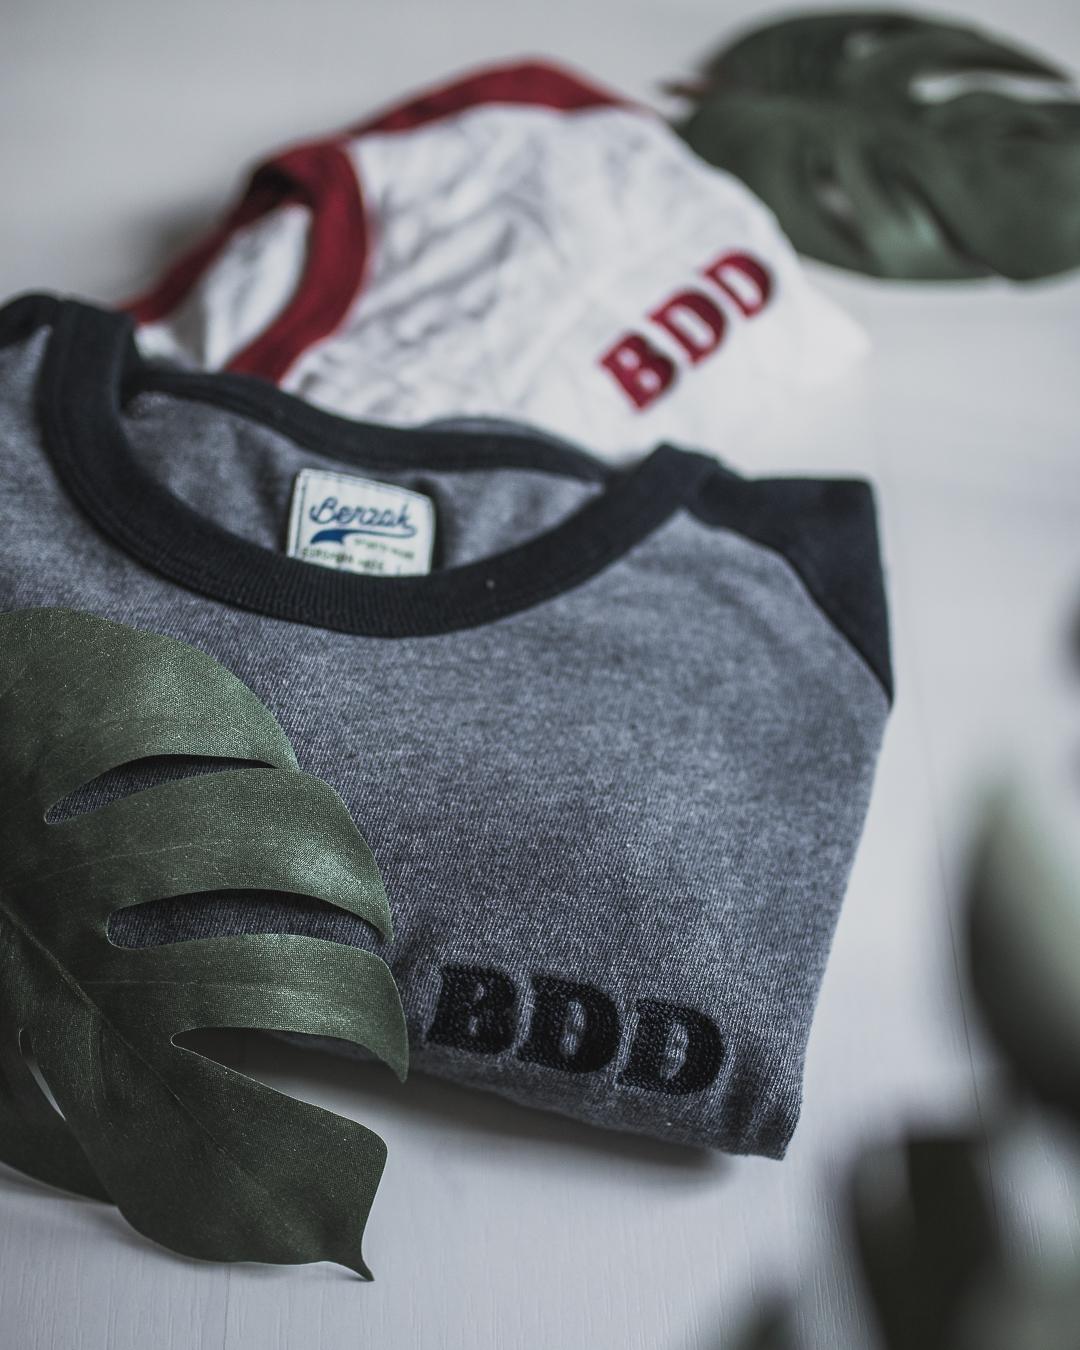 Benzak Denim Developers BaseBall Shirt